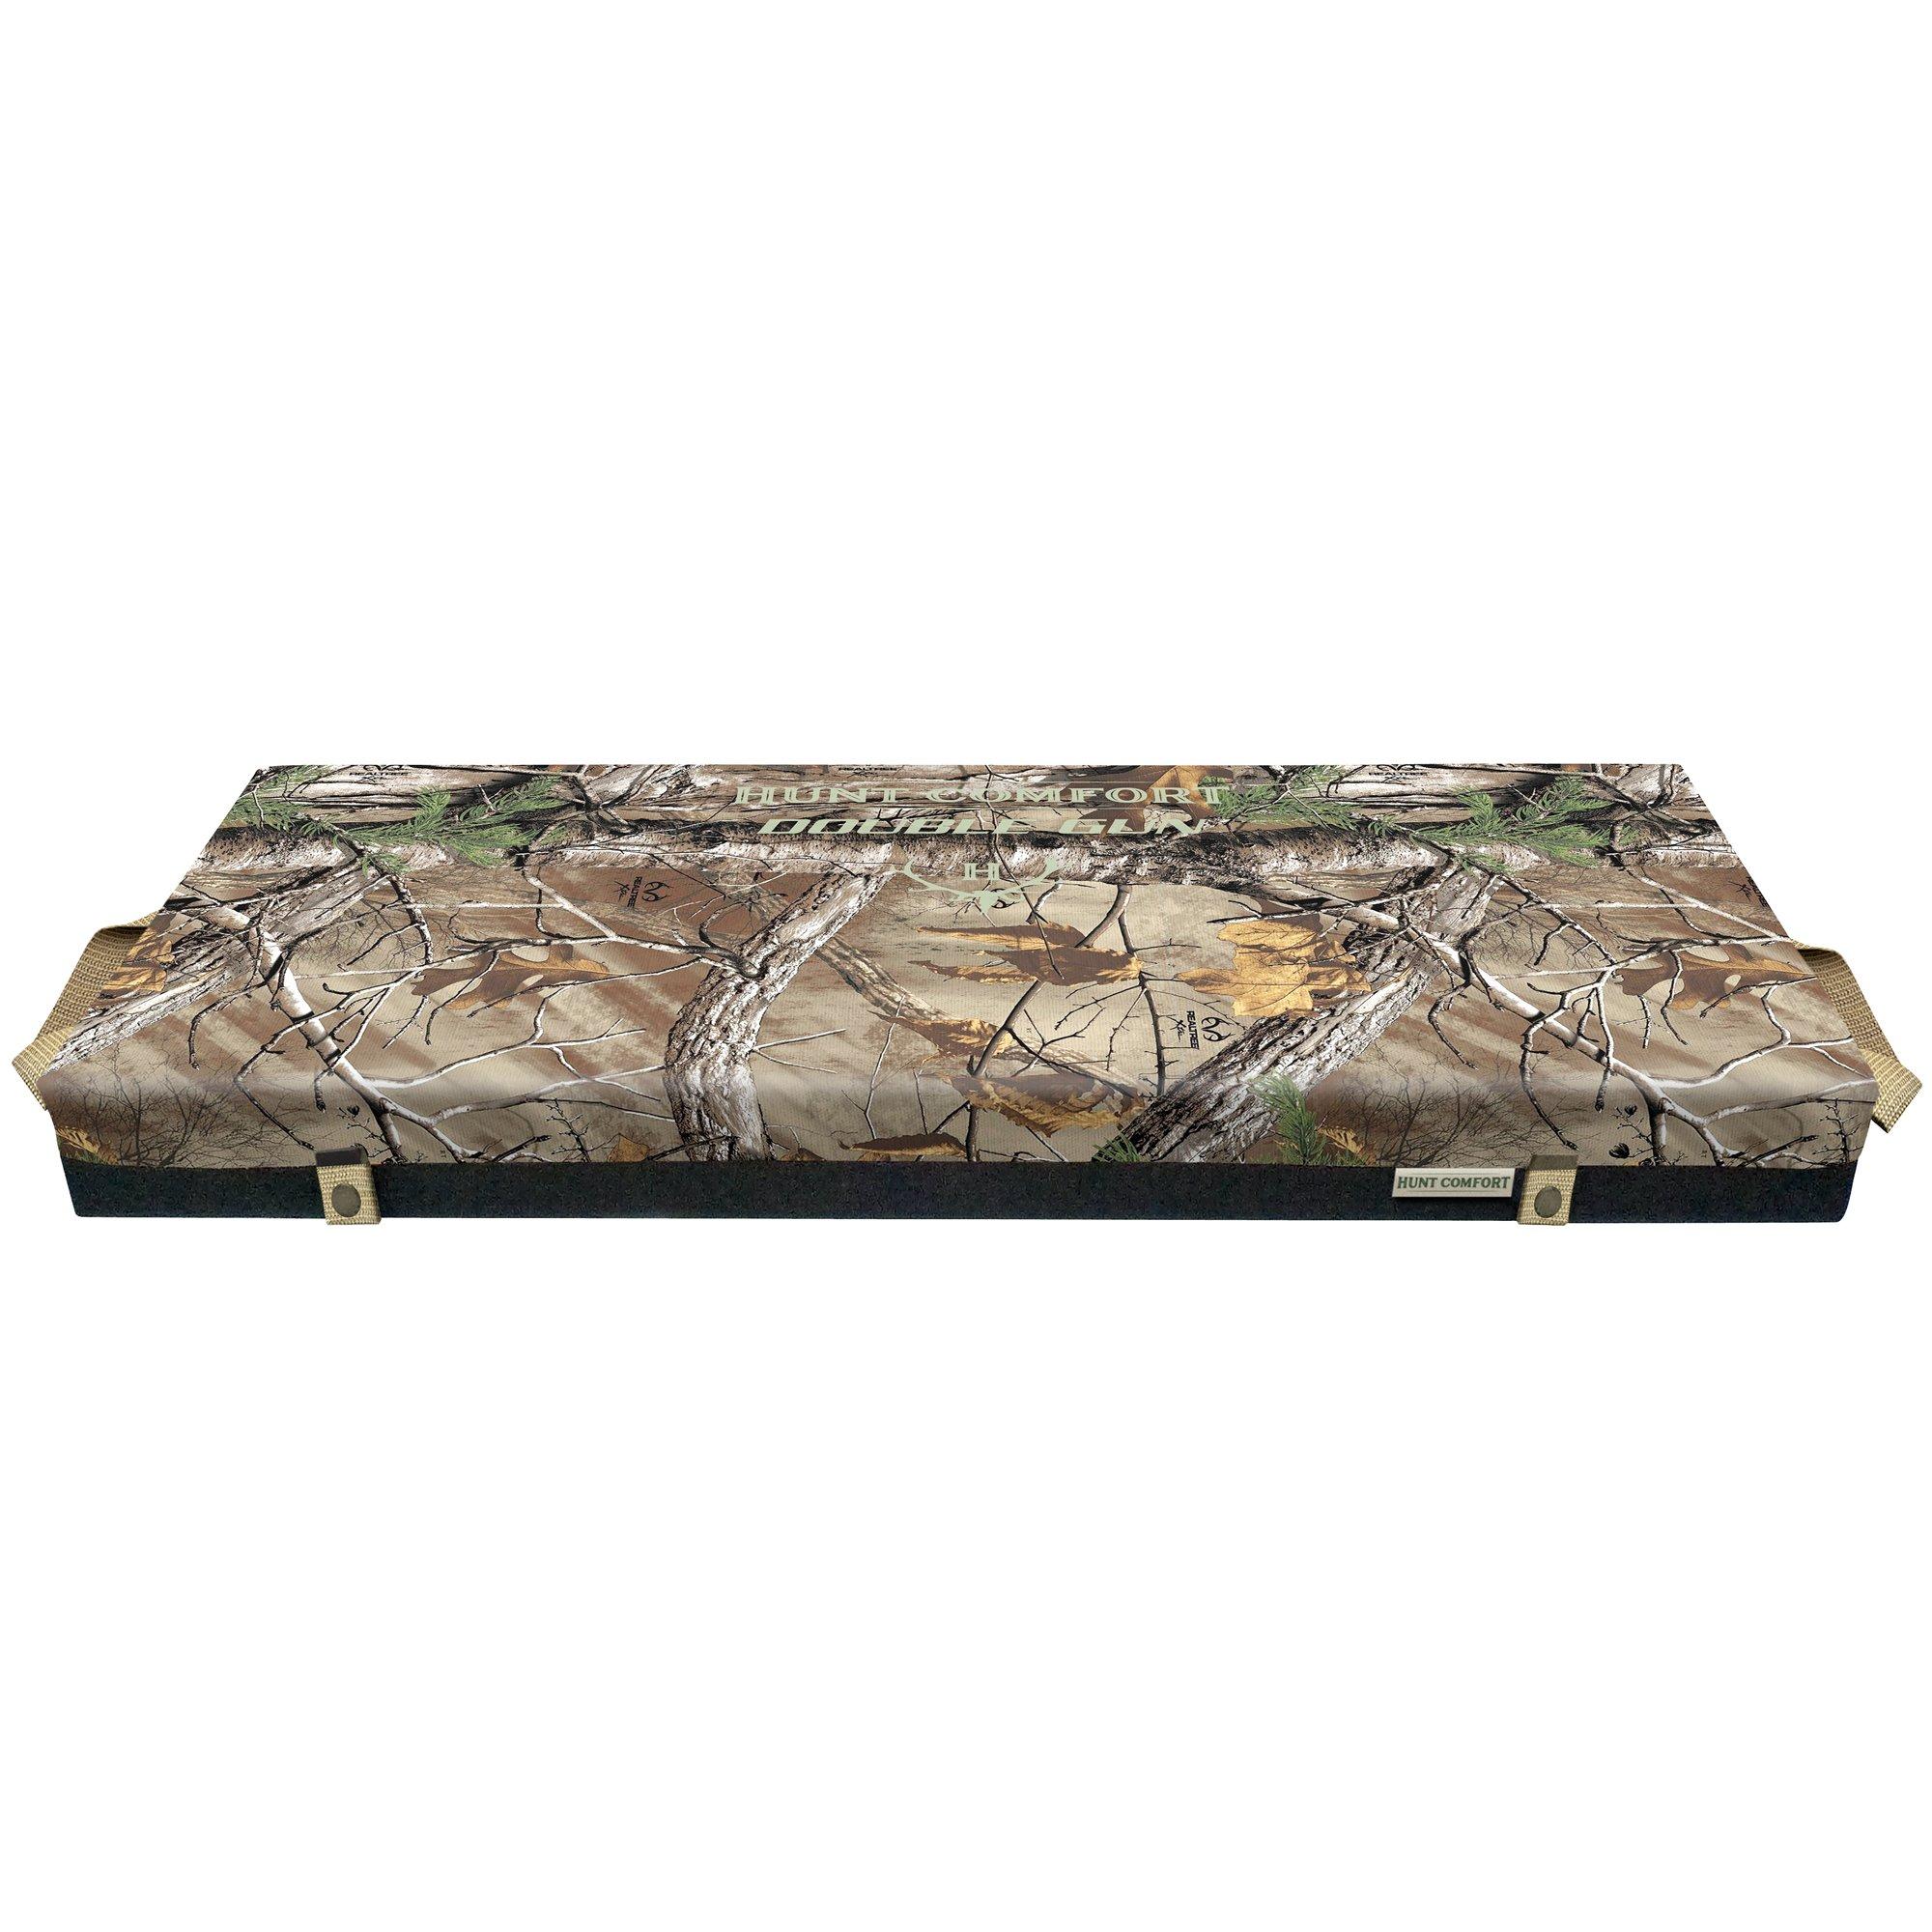 Hunt Comfort Double Gun LiteCore Premium Foam Hunting Seat, Realtree Xtra